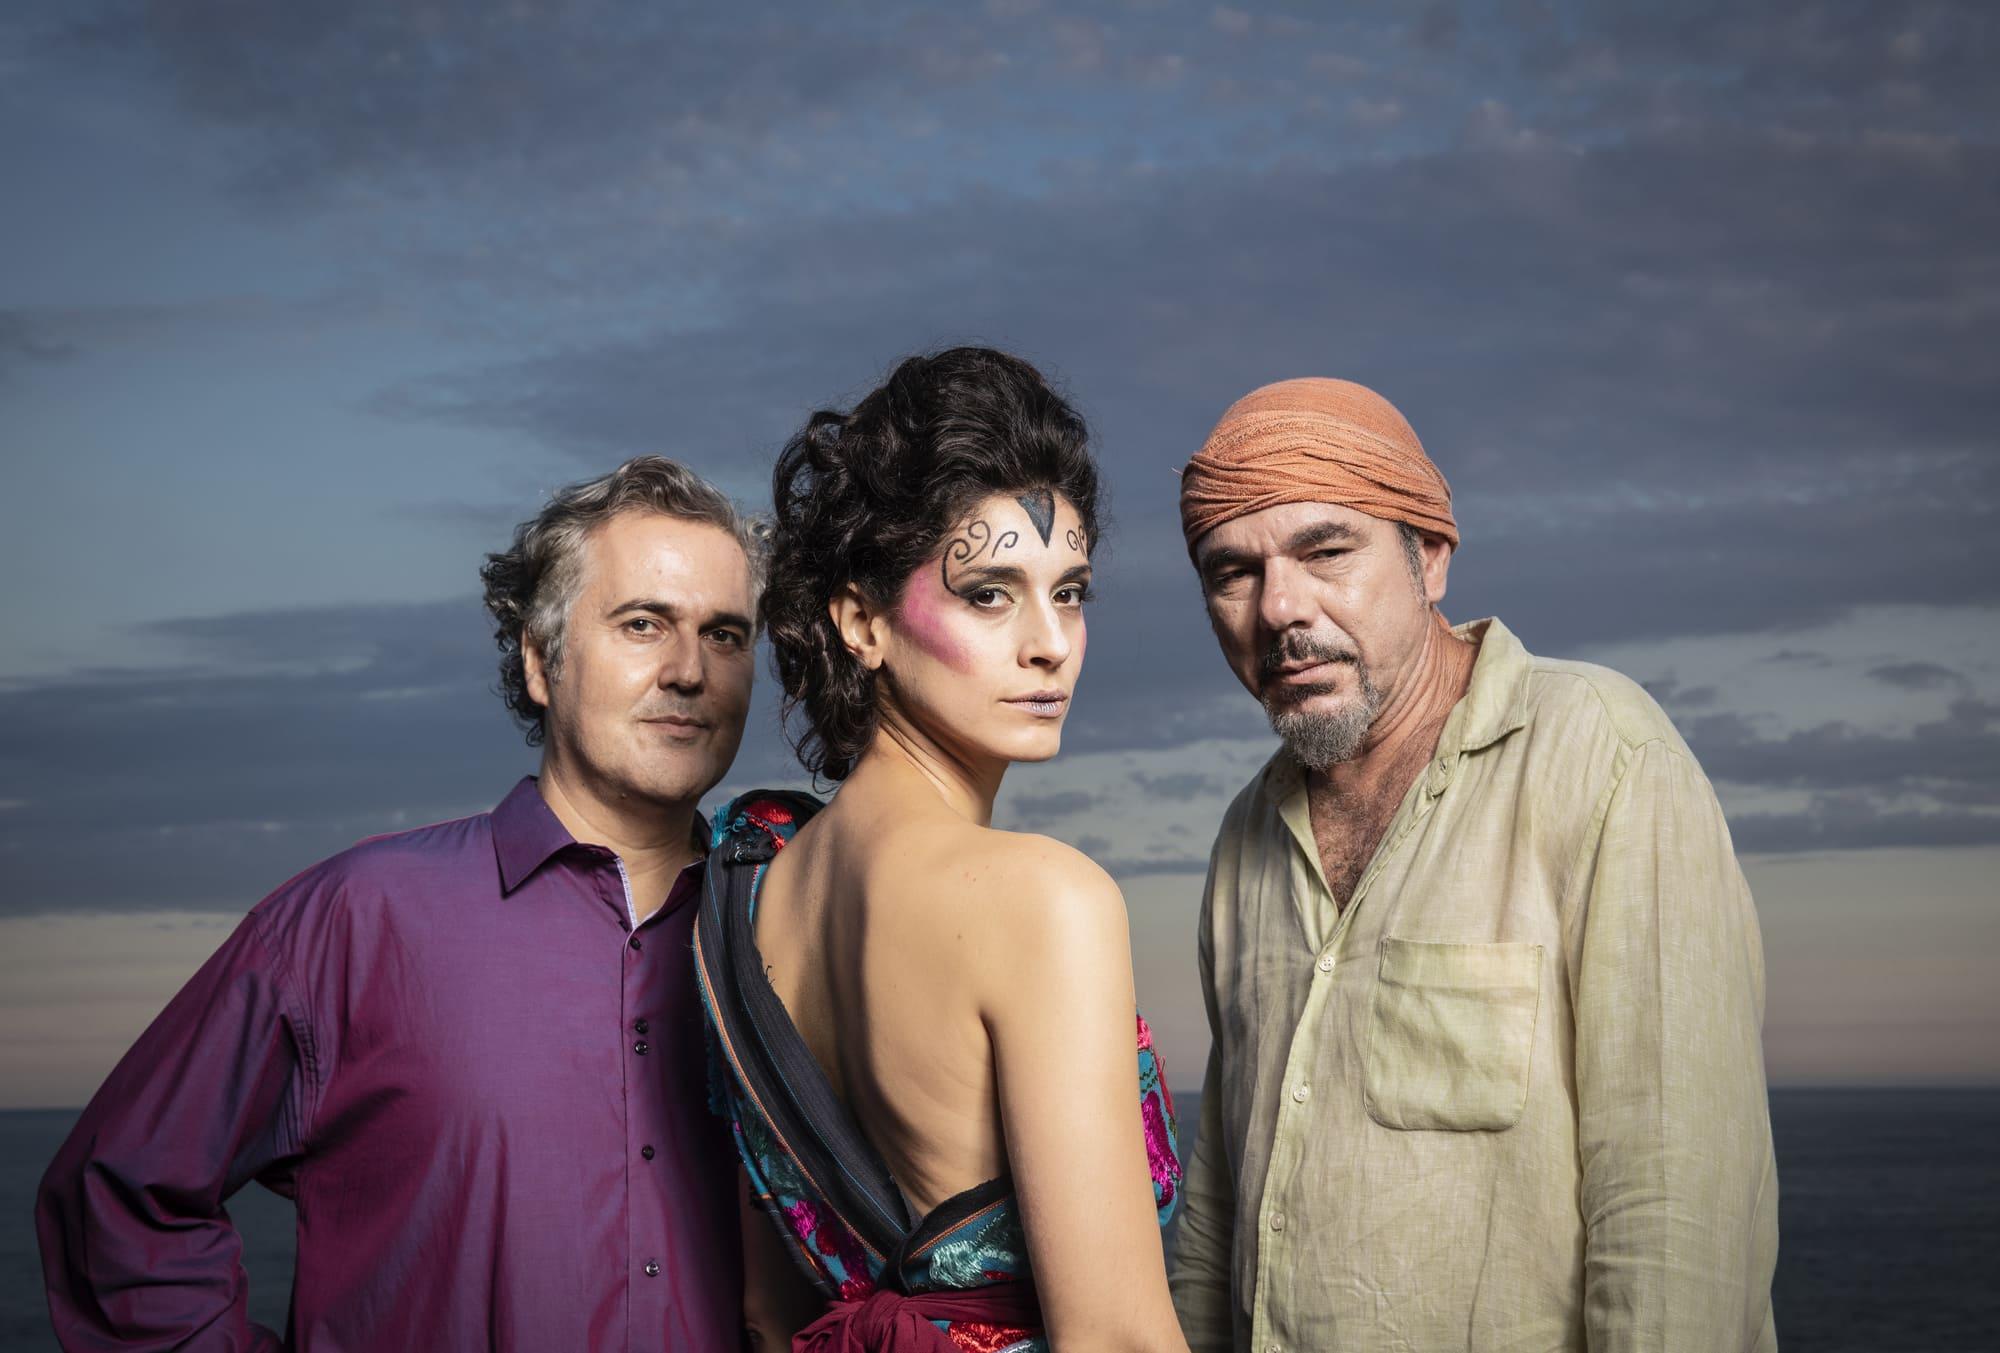 Bianca Gismonti Trio. Foto: Divulgacão/Daryan Dornelles